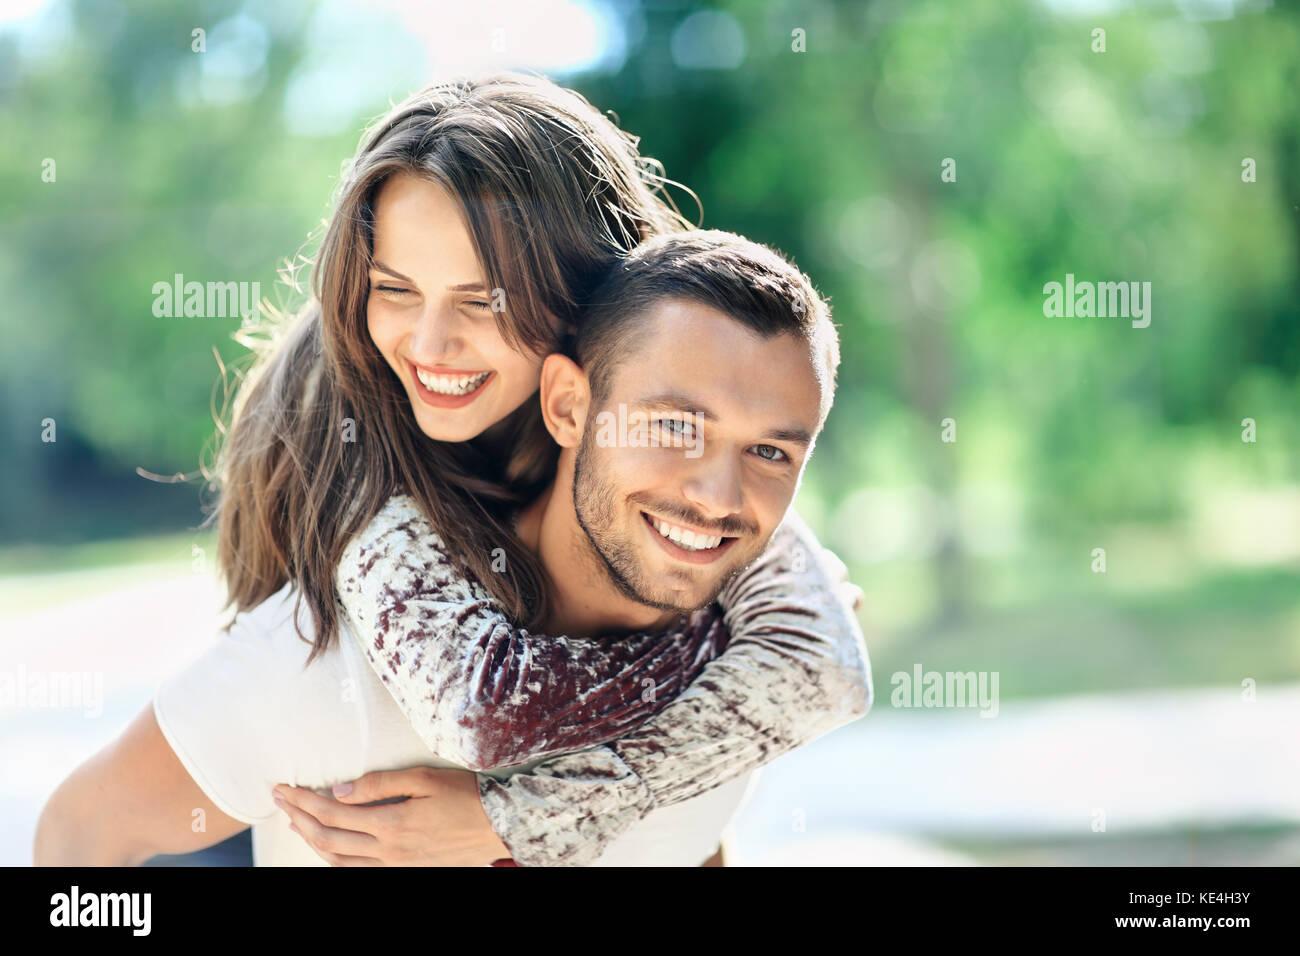 Les amateurs de plein air portrait of happy young man and woman looking at camera. Smiling girl profiter de son Photo Stock